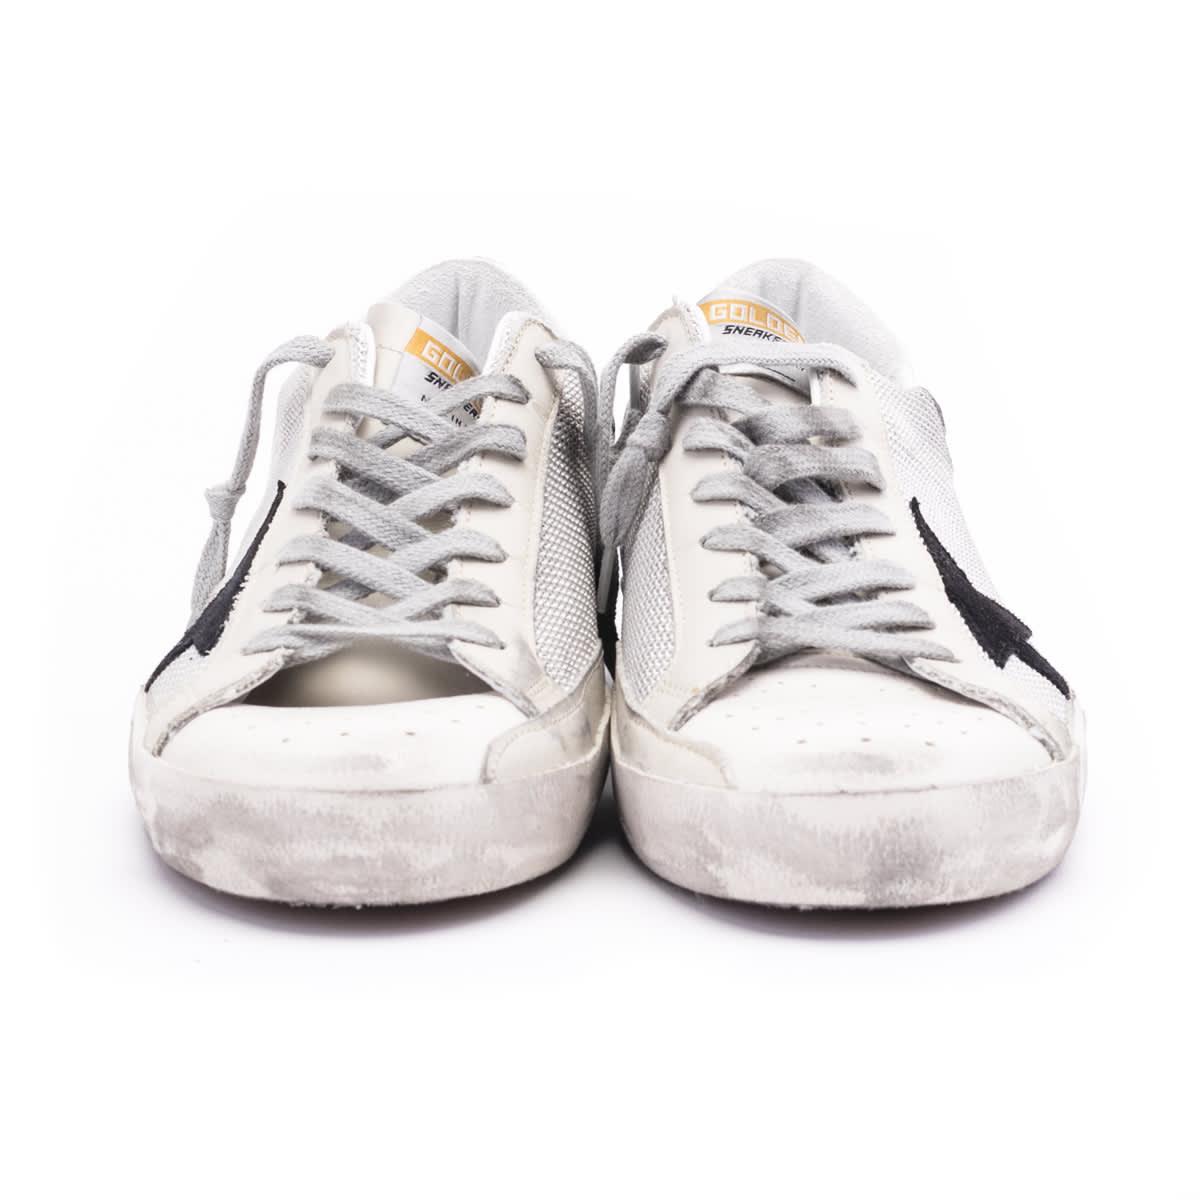 Golden Goose Super Star Sneaker In Silver-milk-black-white